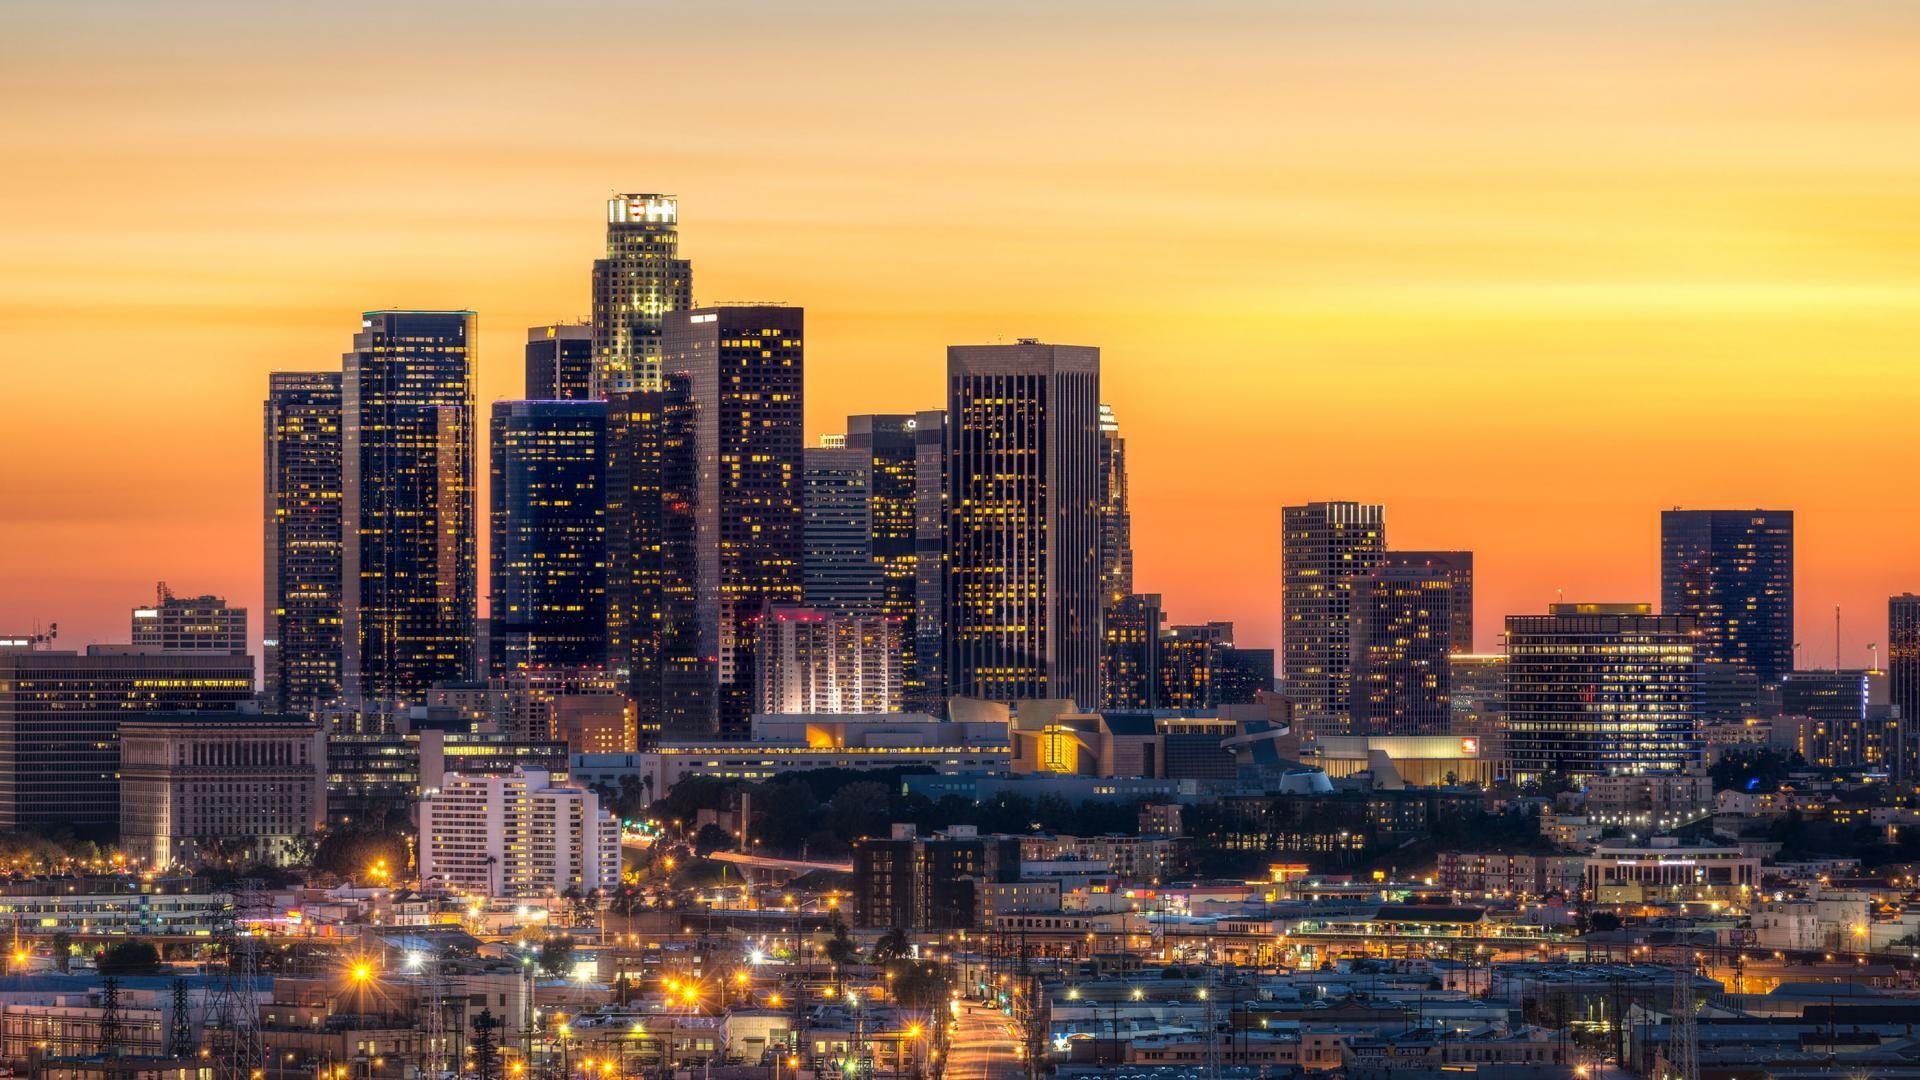 Los Angeles Skyline Luxe Travel Socal Los Angeles Skyline Los Angeles Sunset Skyline